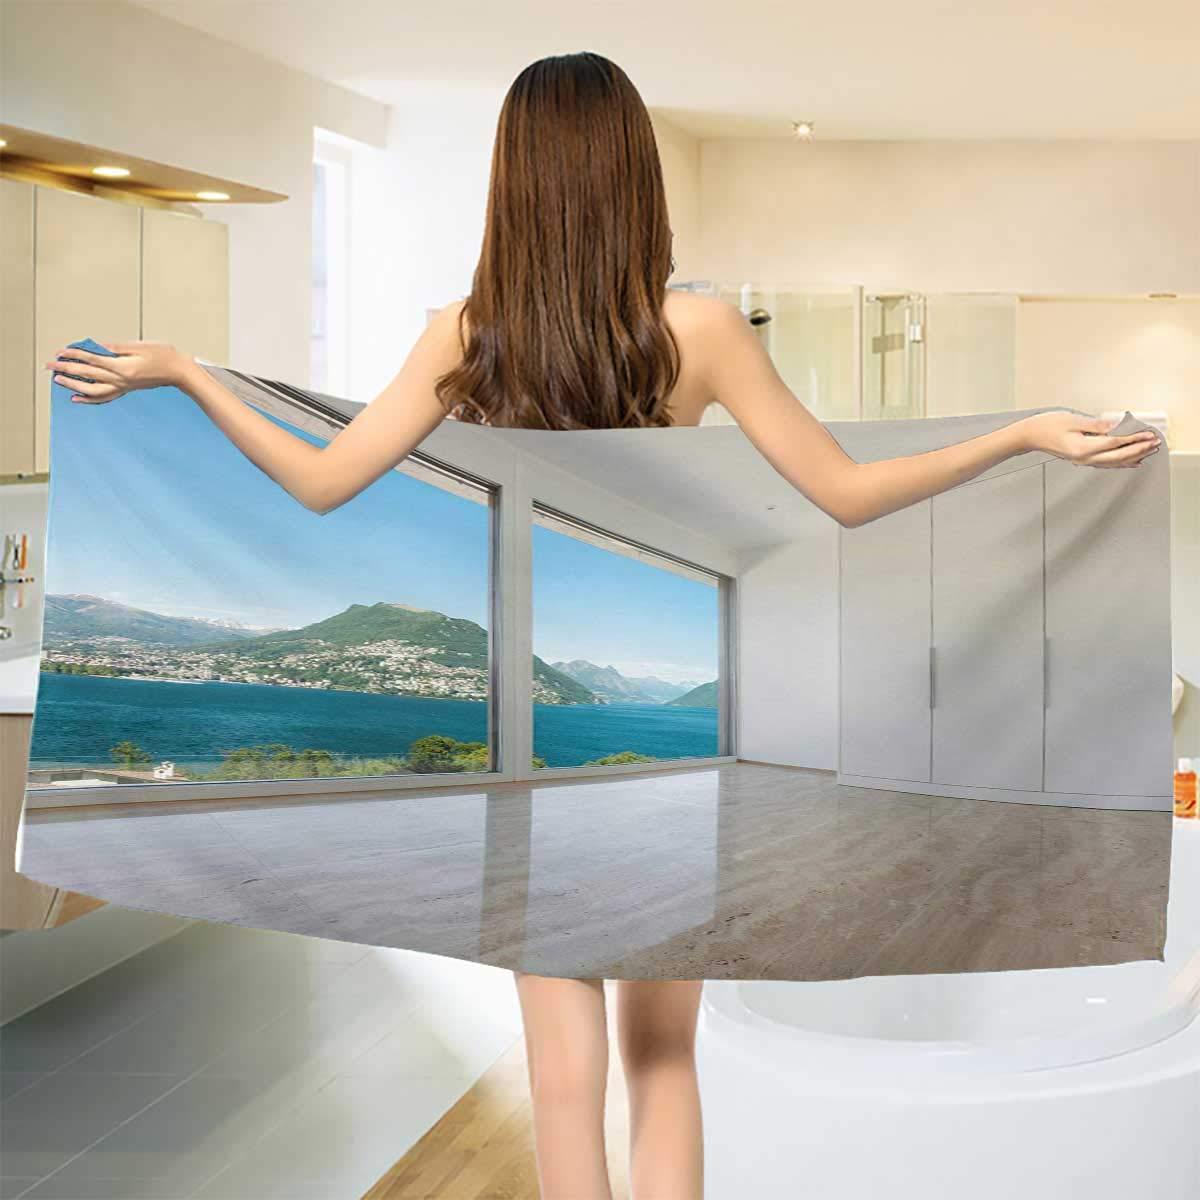 Modern,Bath Towel,Interior of Penthouse Empty Living Room Large Windows Sea Mountains View Art,Bathroom Towels,White Blue Beige Size: W 27.5'' x L 55''